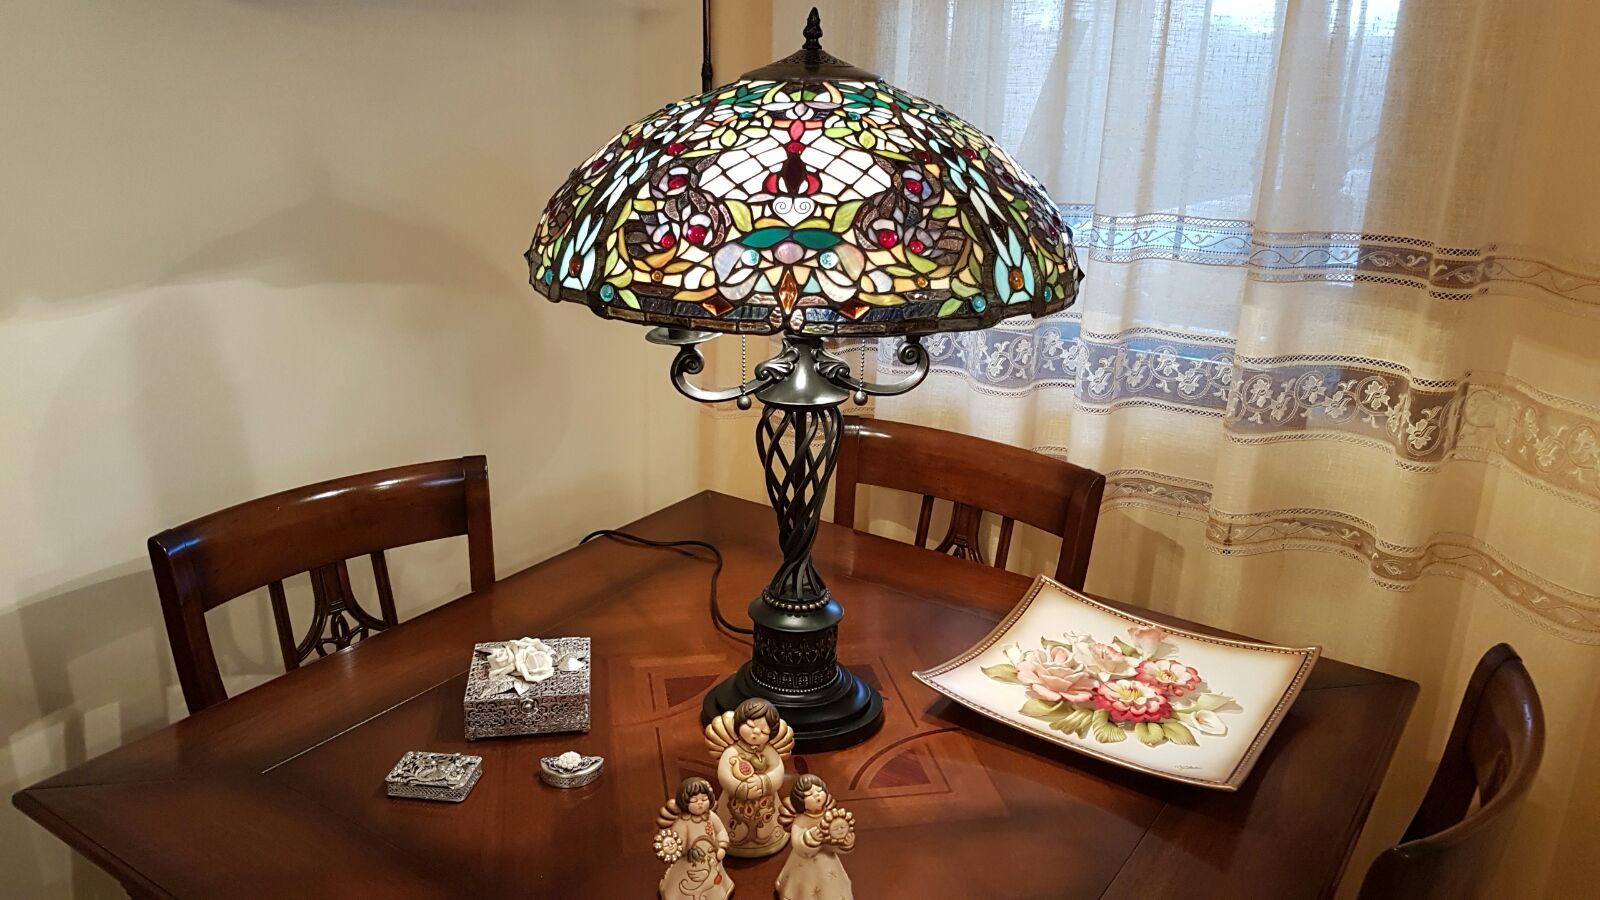 Plafoniere Stile Tiffany : Lampada tiffany a mosaico da tavolo